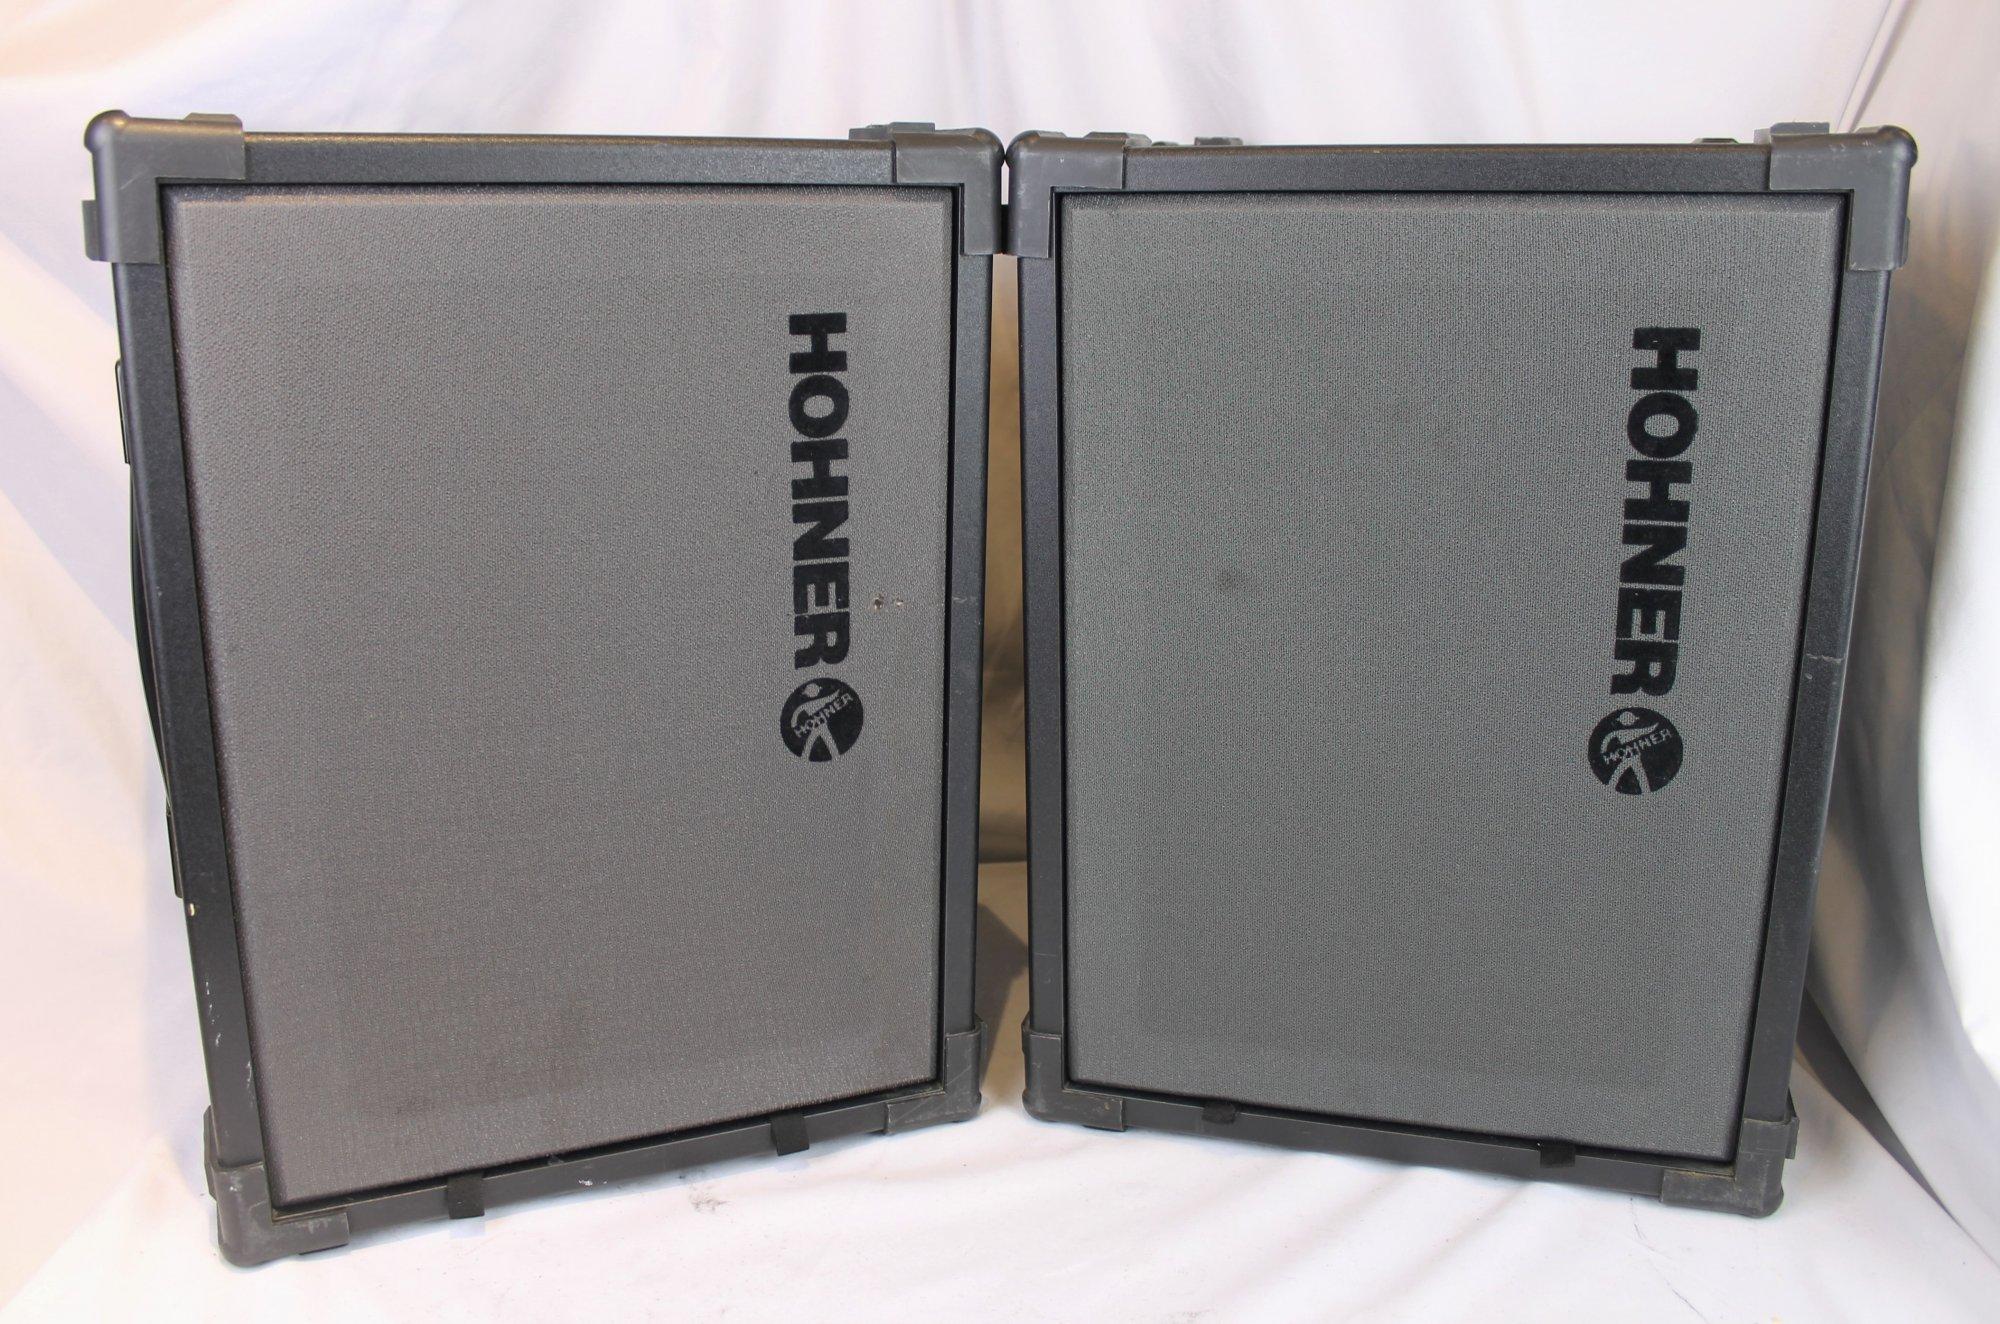 4293 - Hohner H1 110 Watt RMS 2-Way PA Speakers